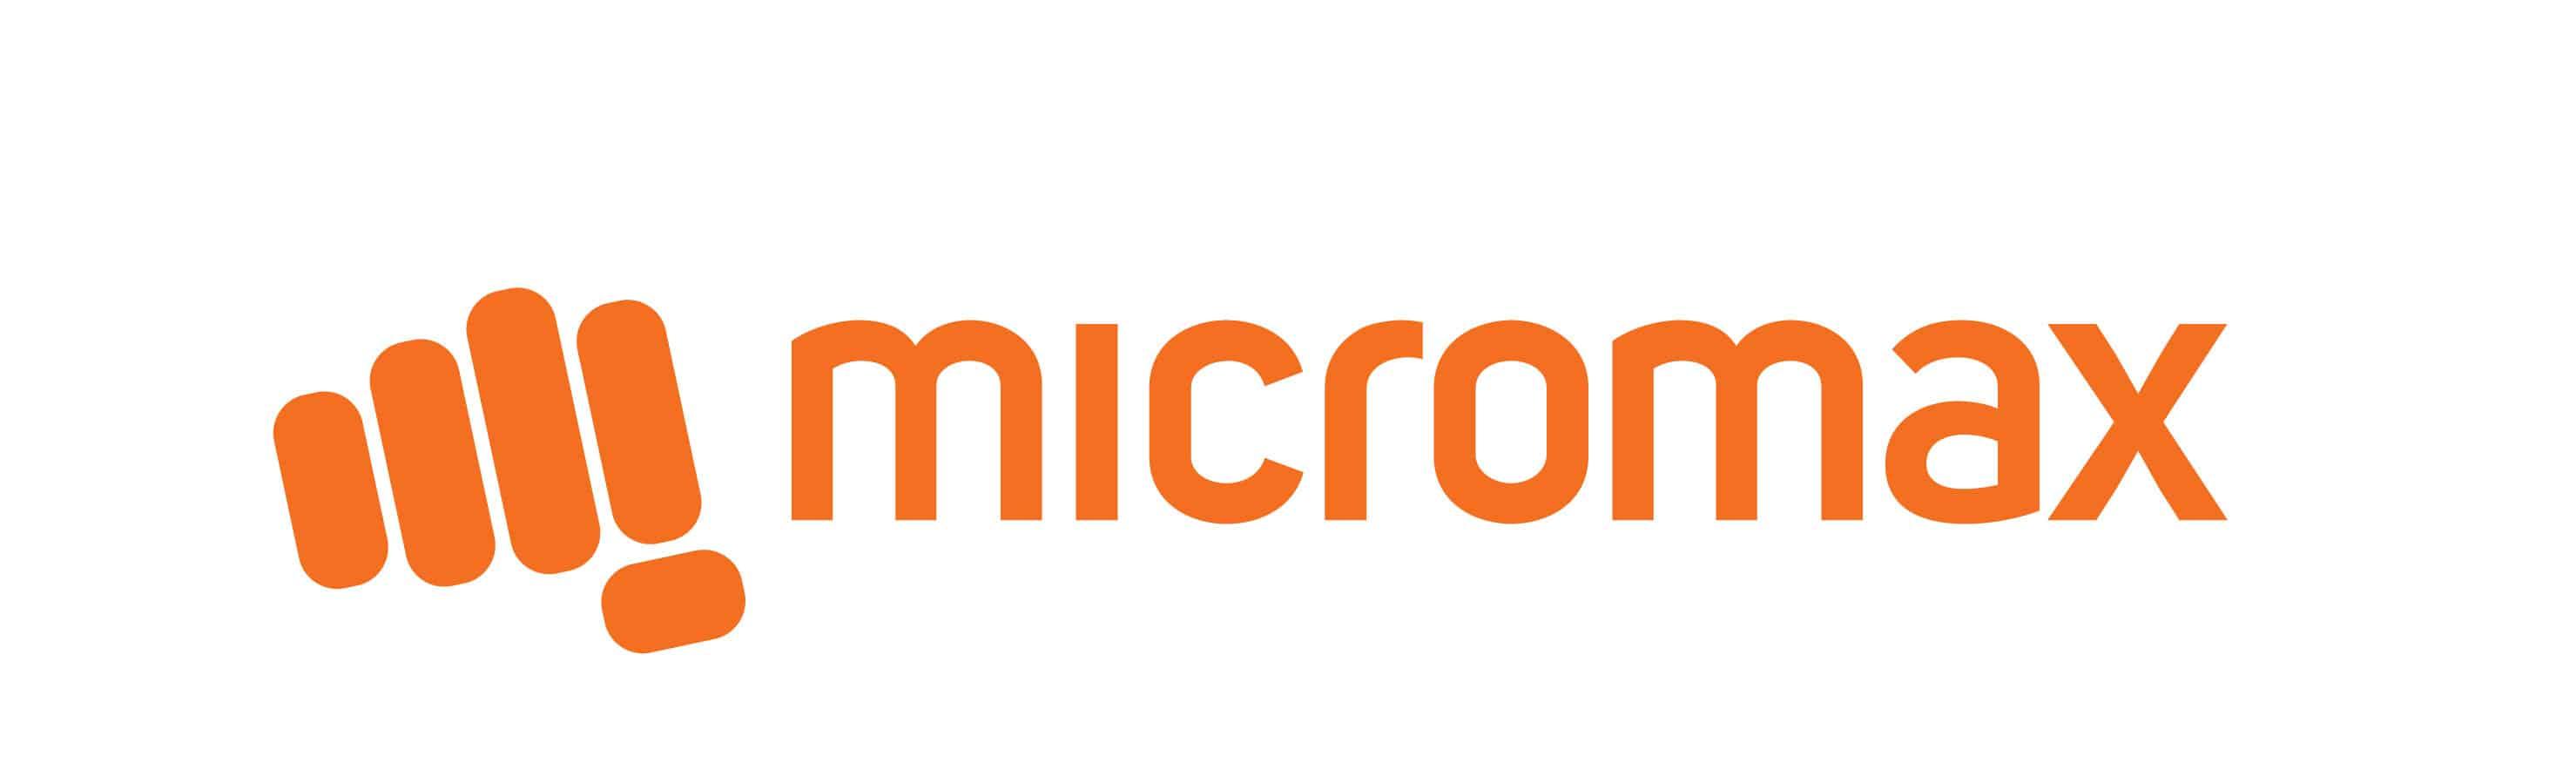 Micromax Mobile Logo Png | www.pixshark.com - Images ...